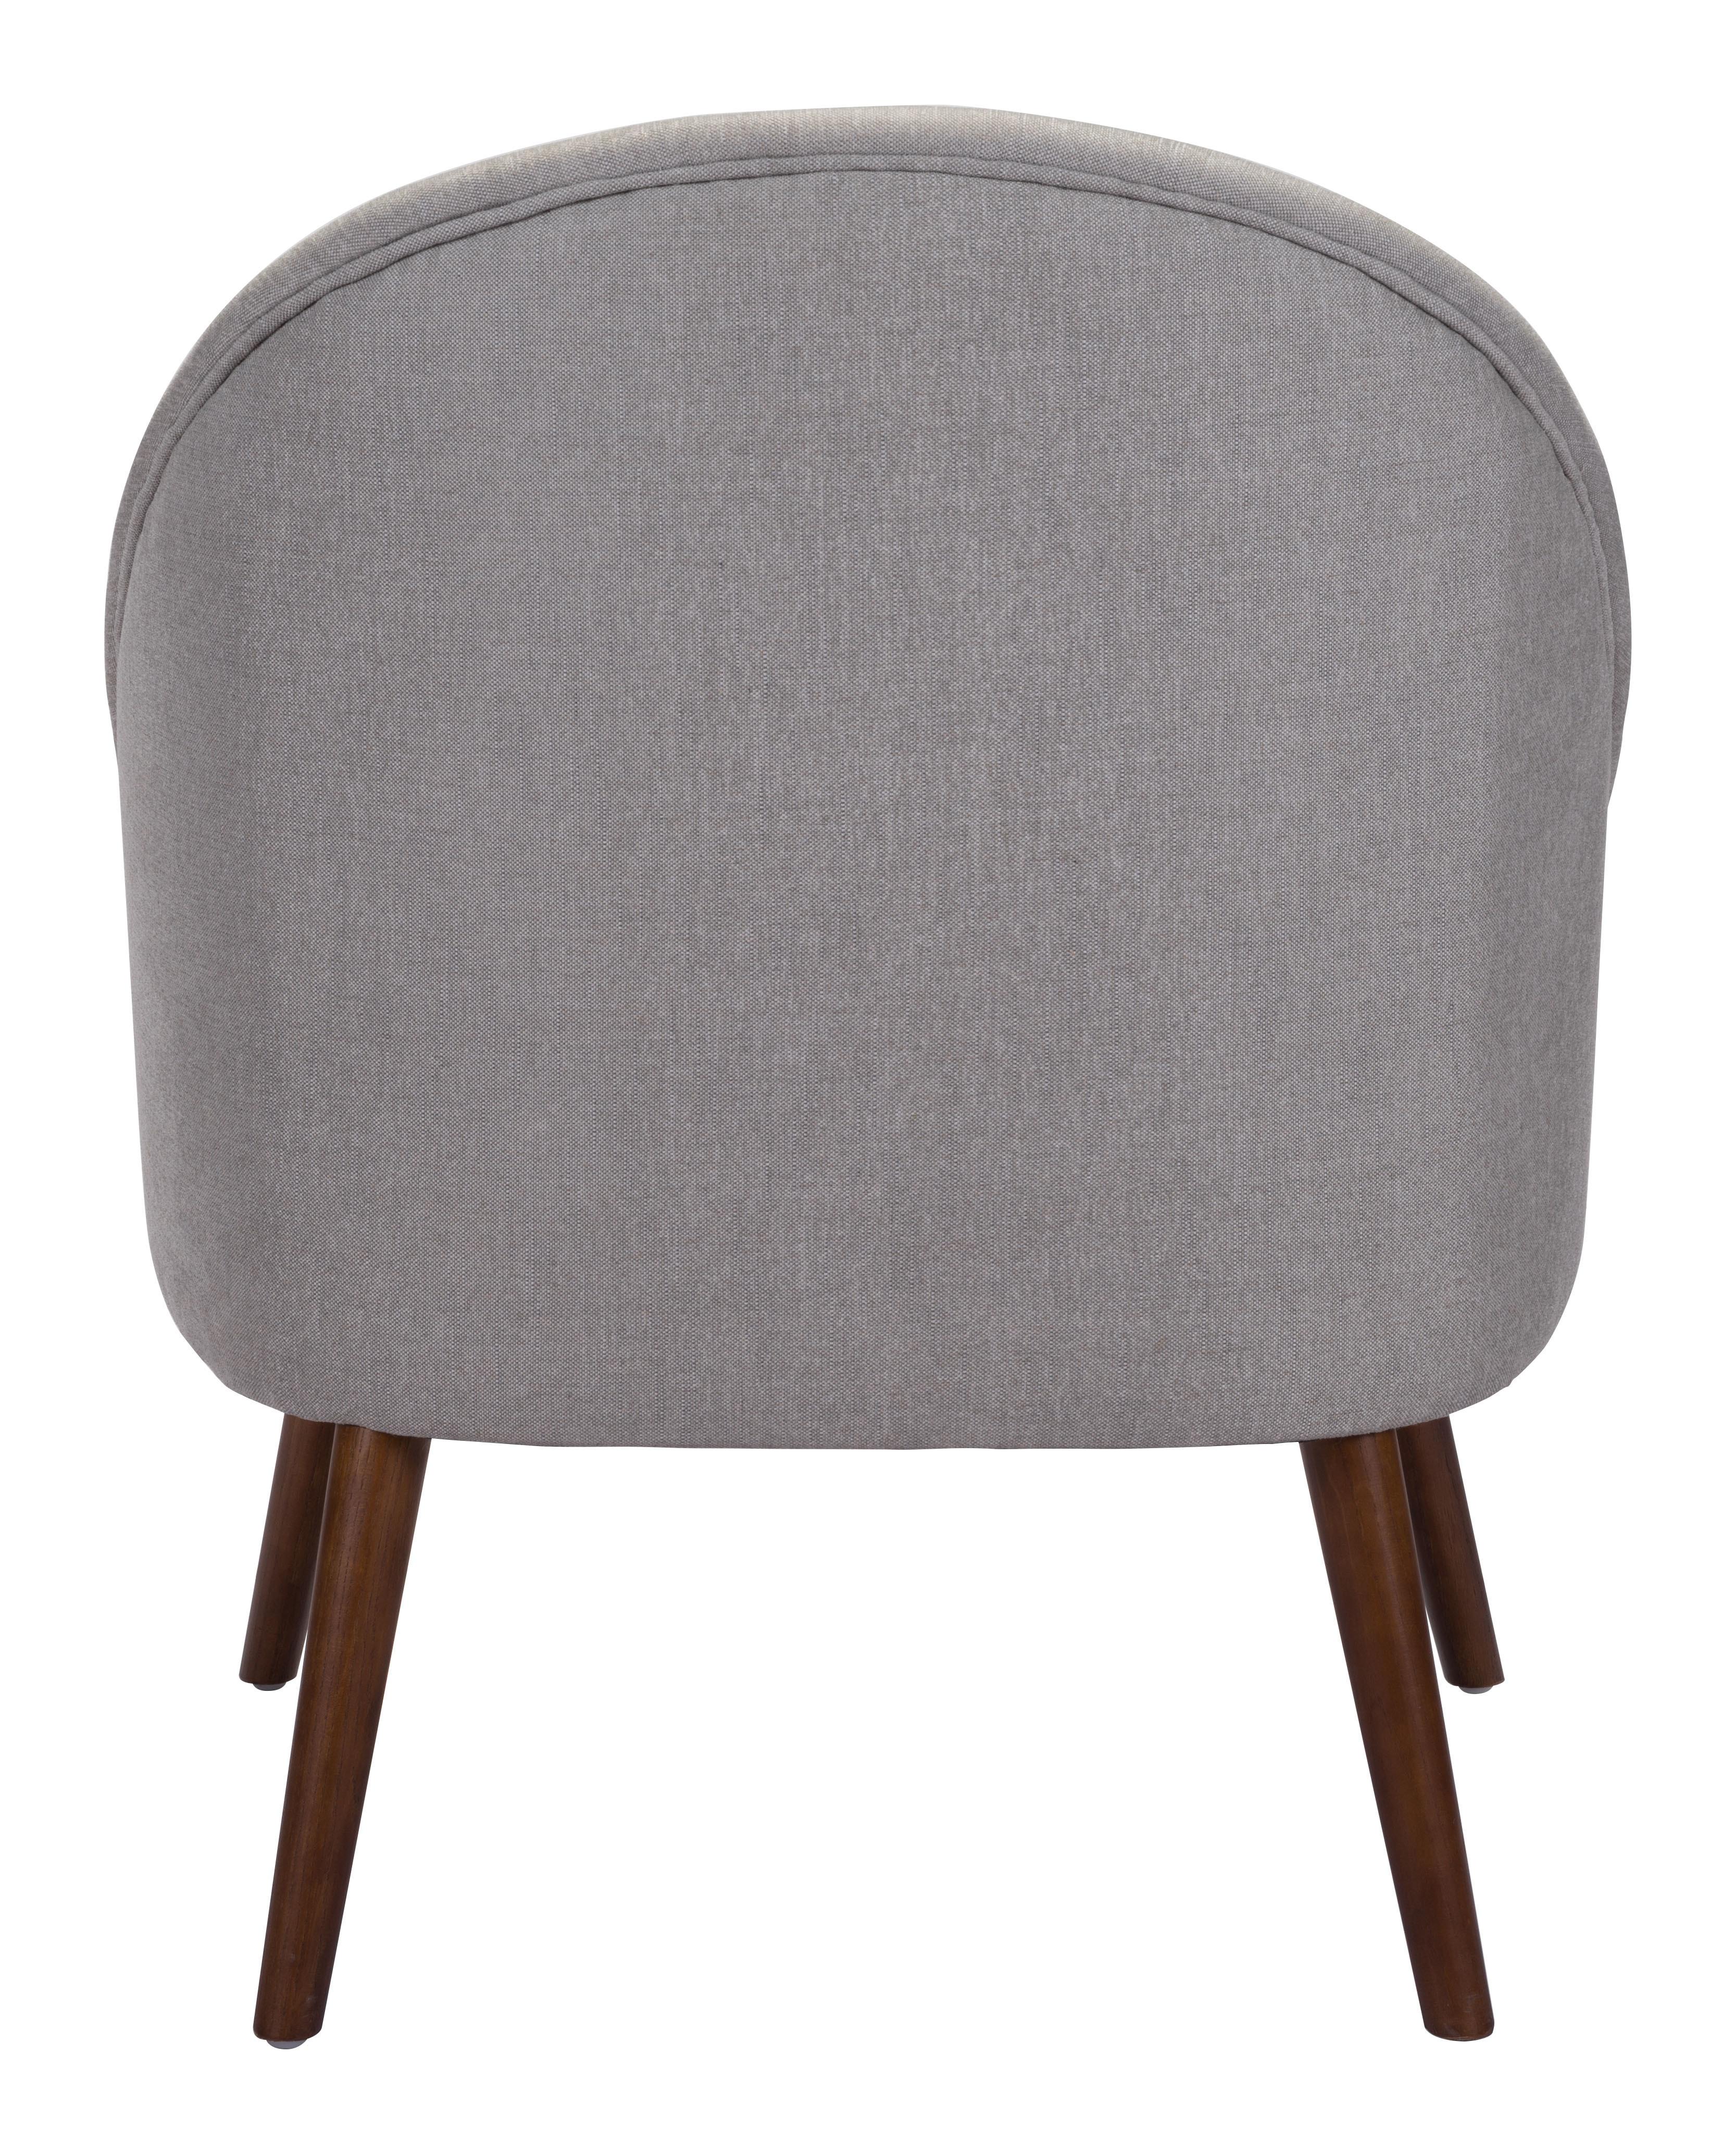 Zuo Modern Carter Occasional Chair Light Gray Occasional Chair 1